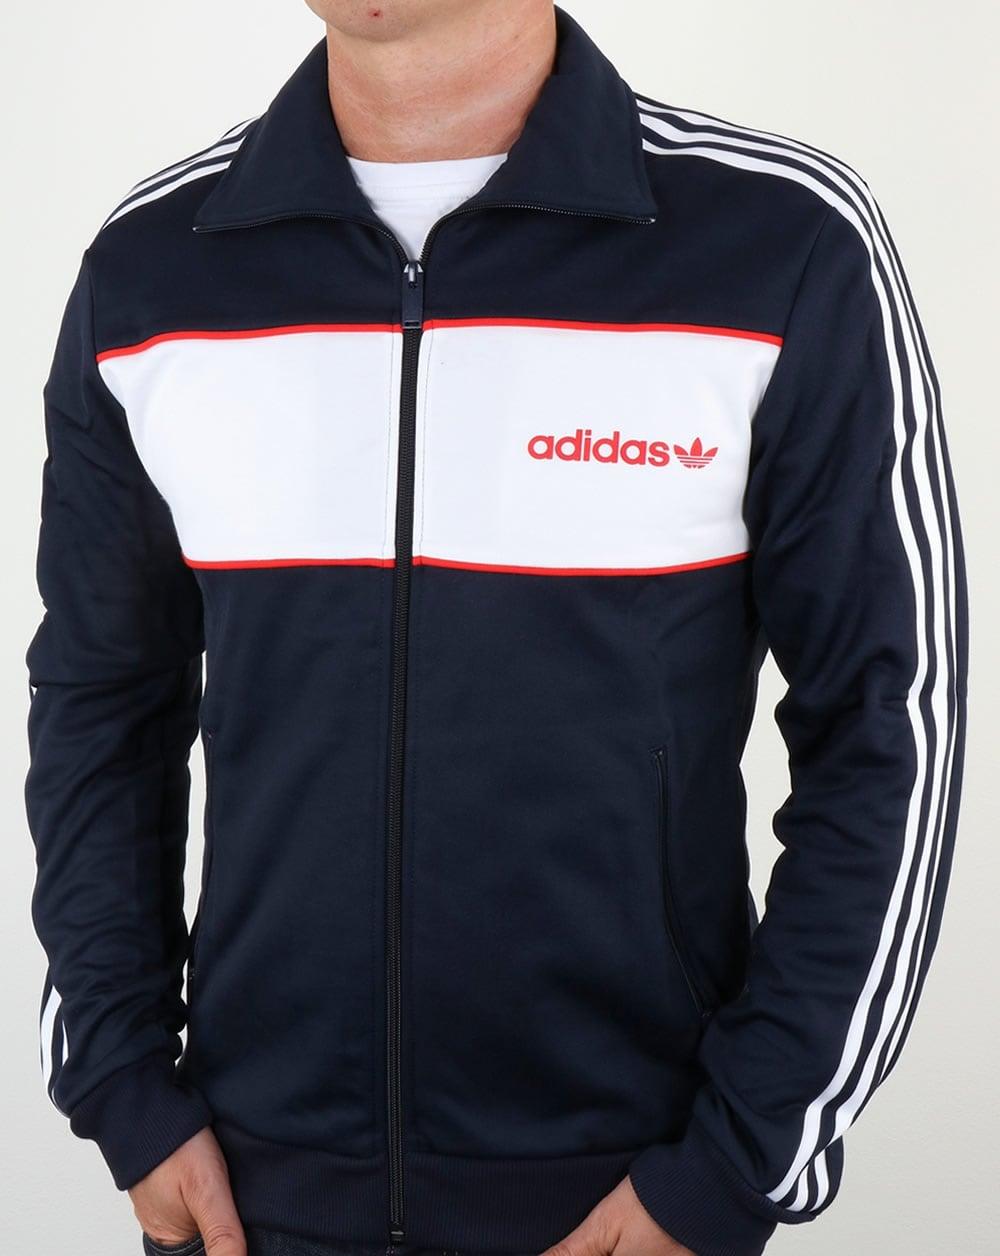 Adidas Top Ten Hi Sleek Bow Zip Trainers: Adidas Originals Block Track Top Navy,tracksuit,jacket,mens